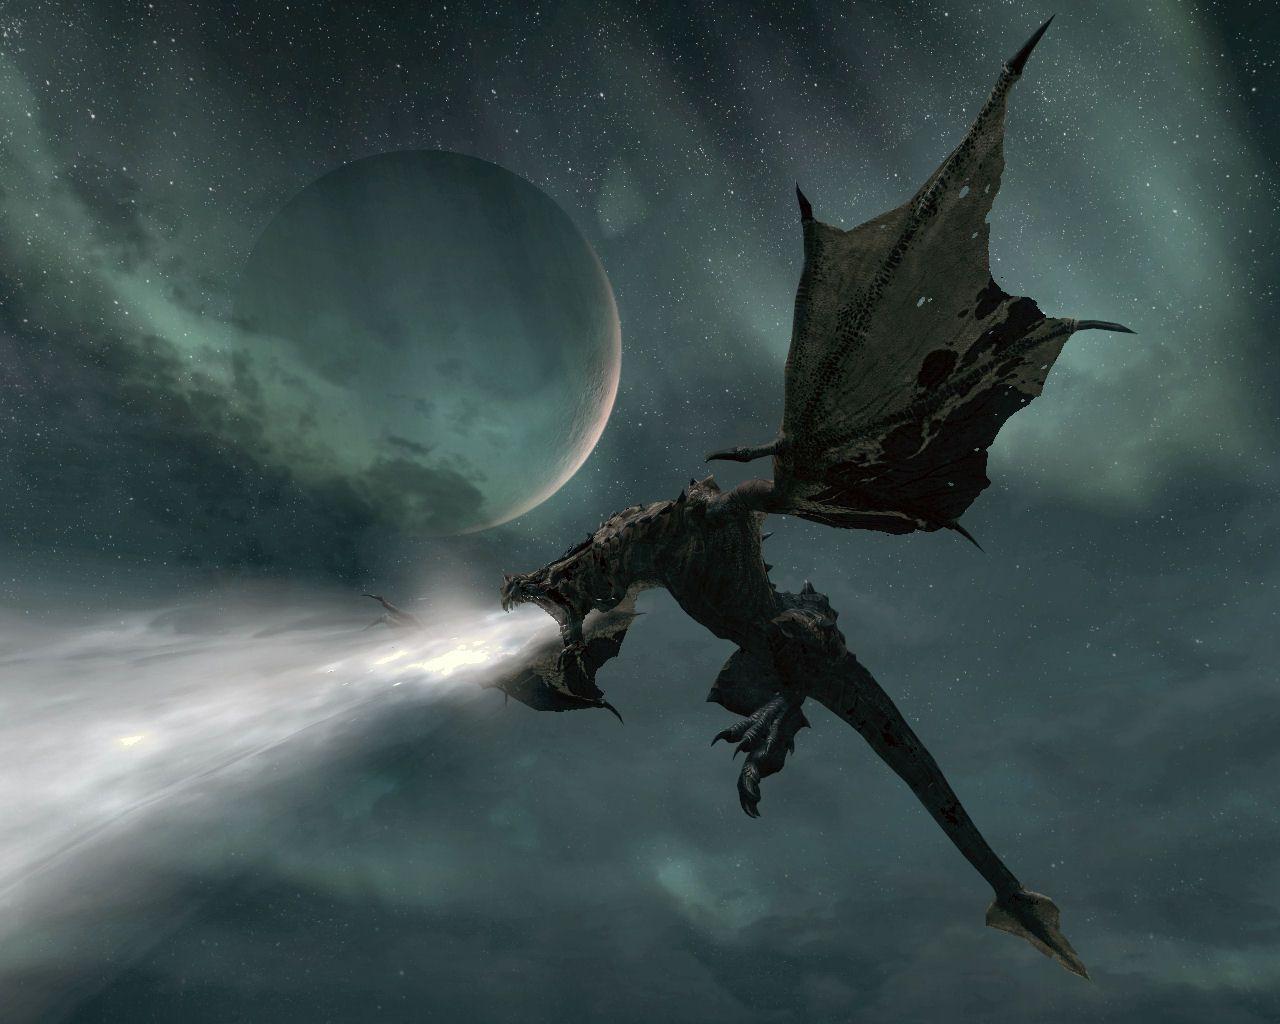 dragons breathing fire skyrim - Google Search | Fantasy ...